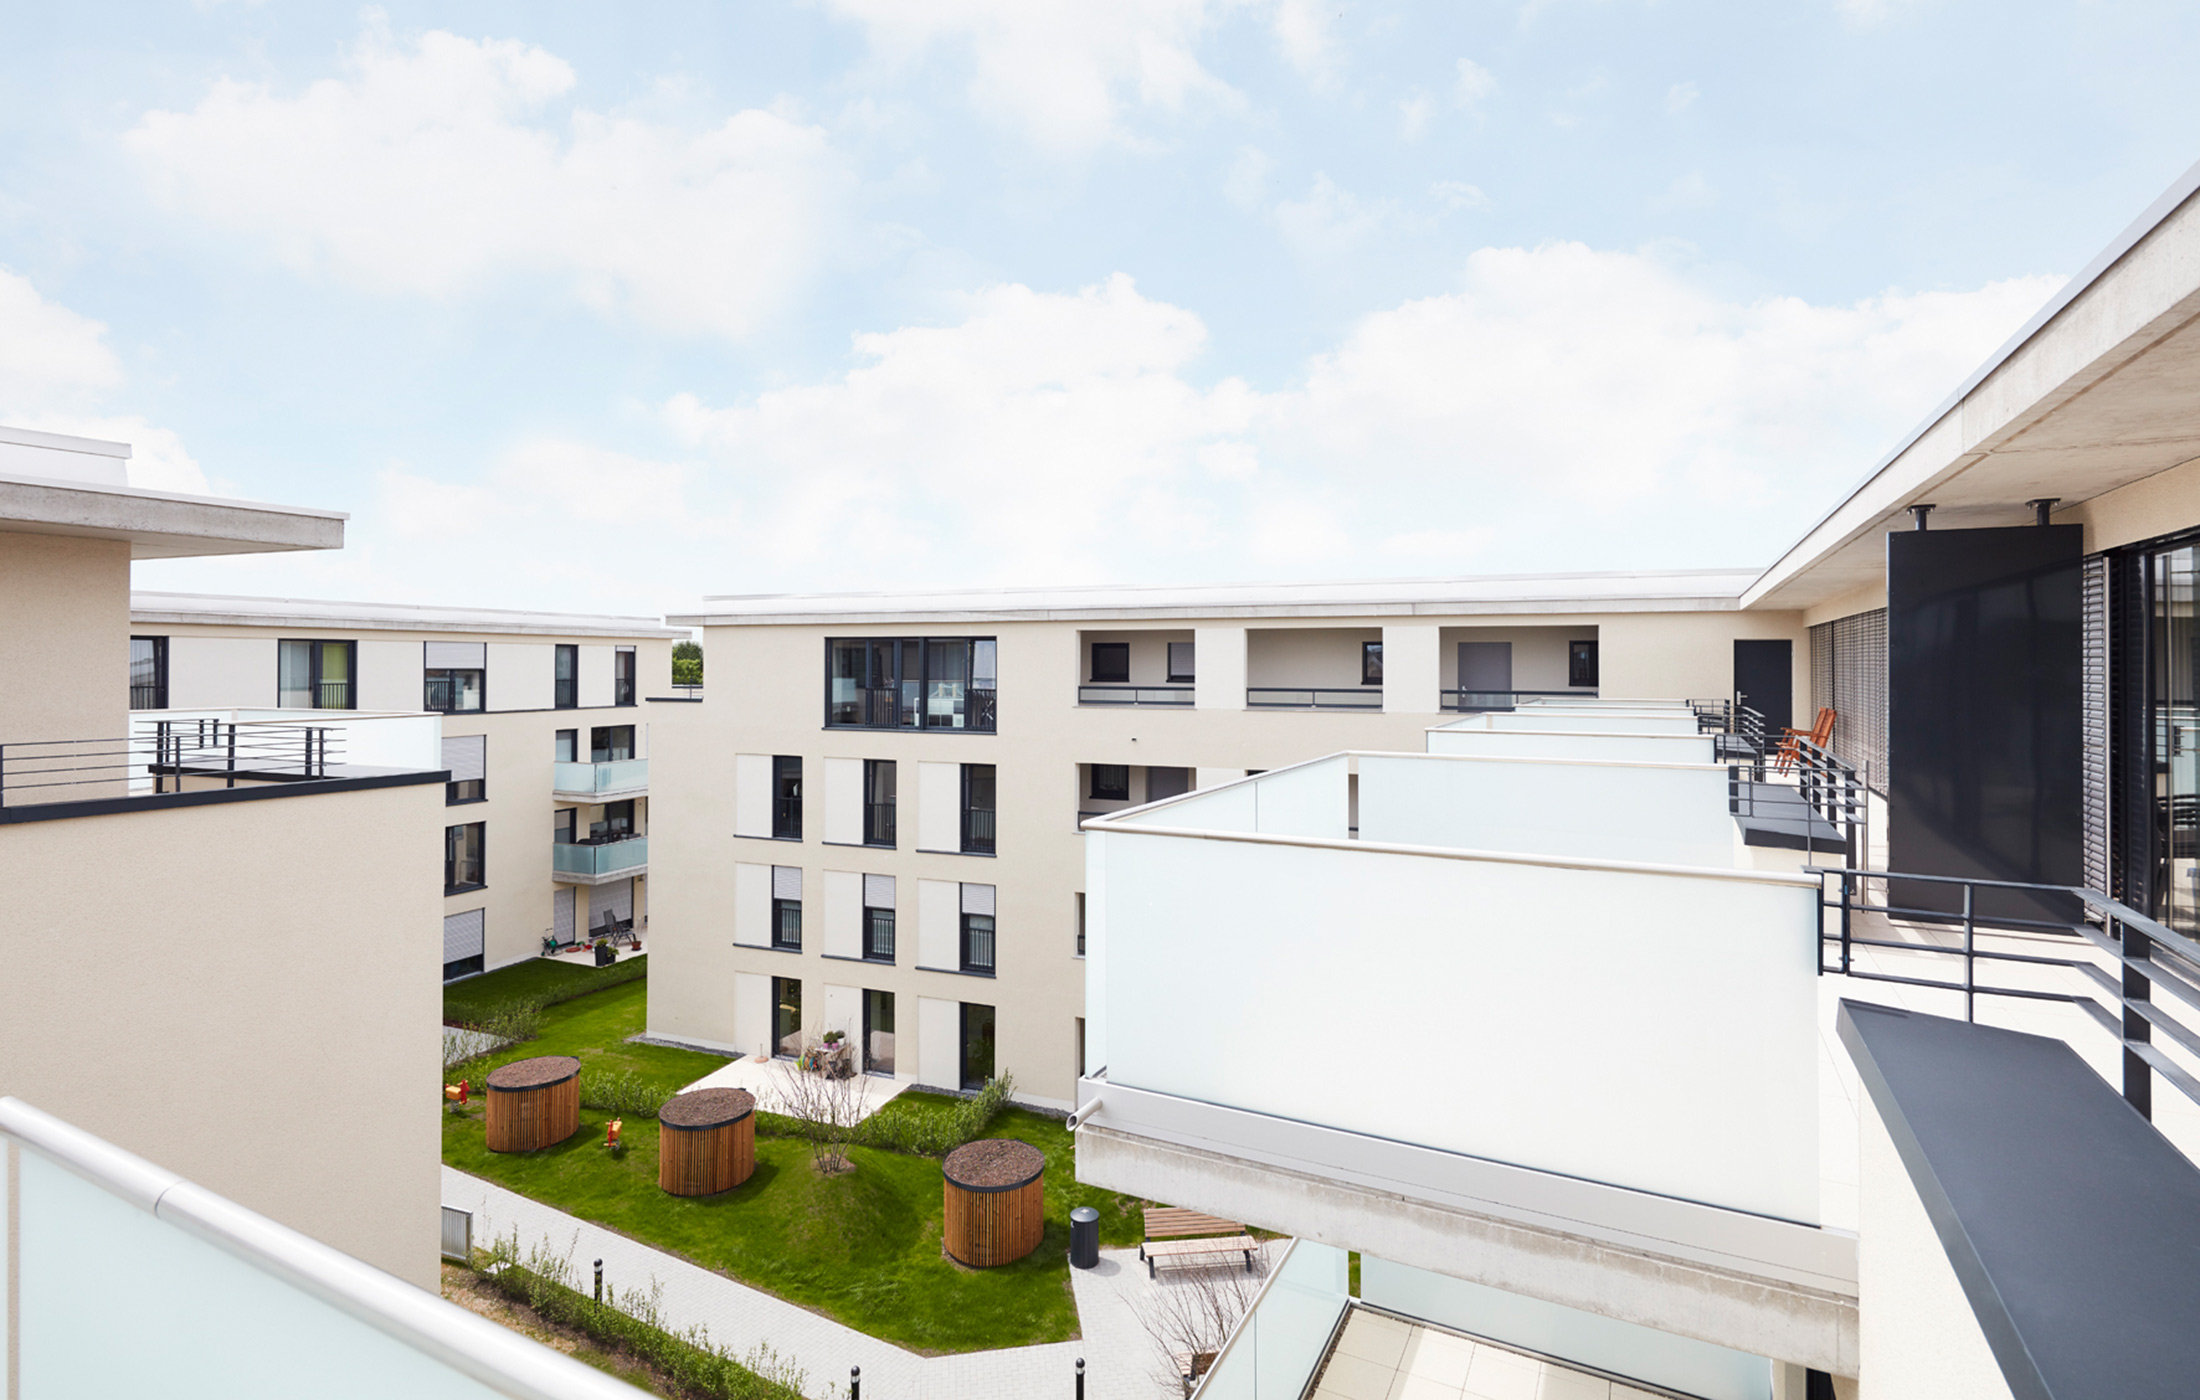 2017_Wohnungsbau_Neubau_Einzelhande_Generalplanung_Koroneo_Korntal_Edeka